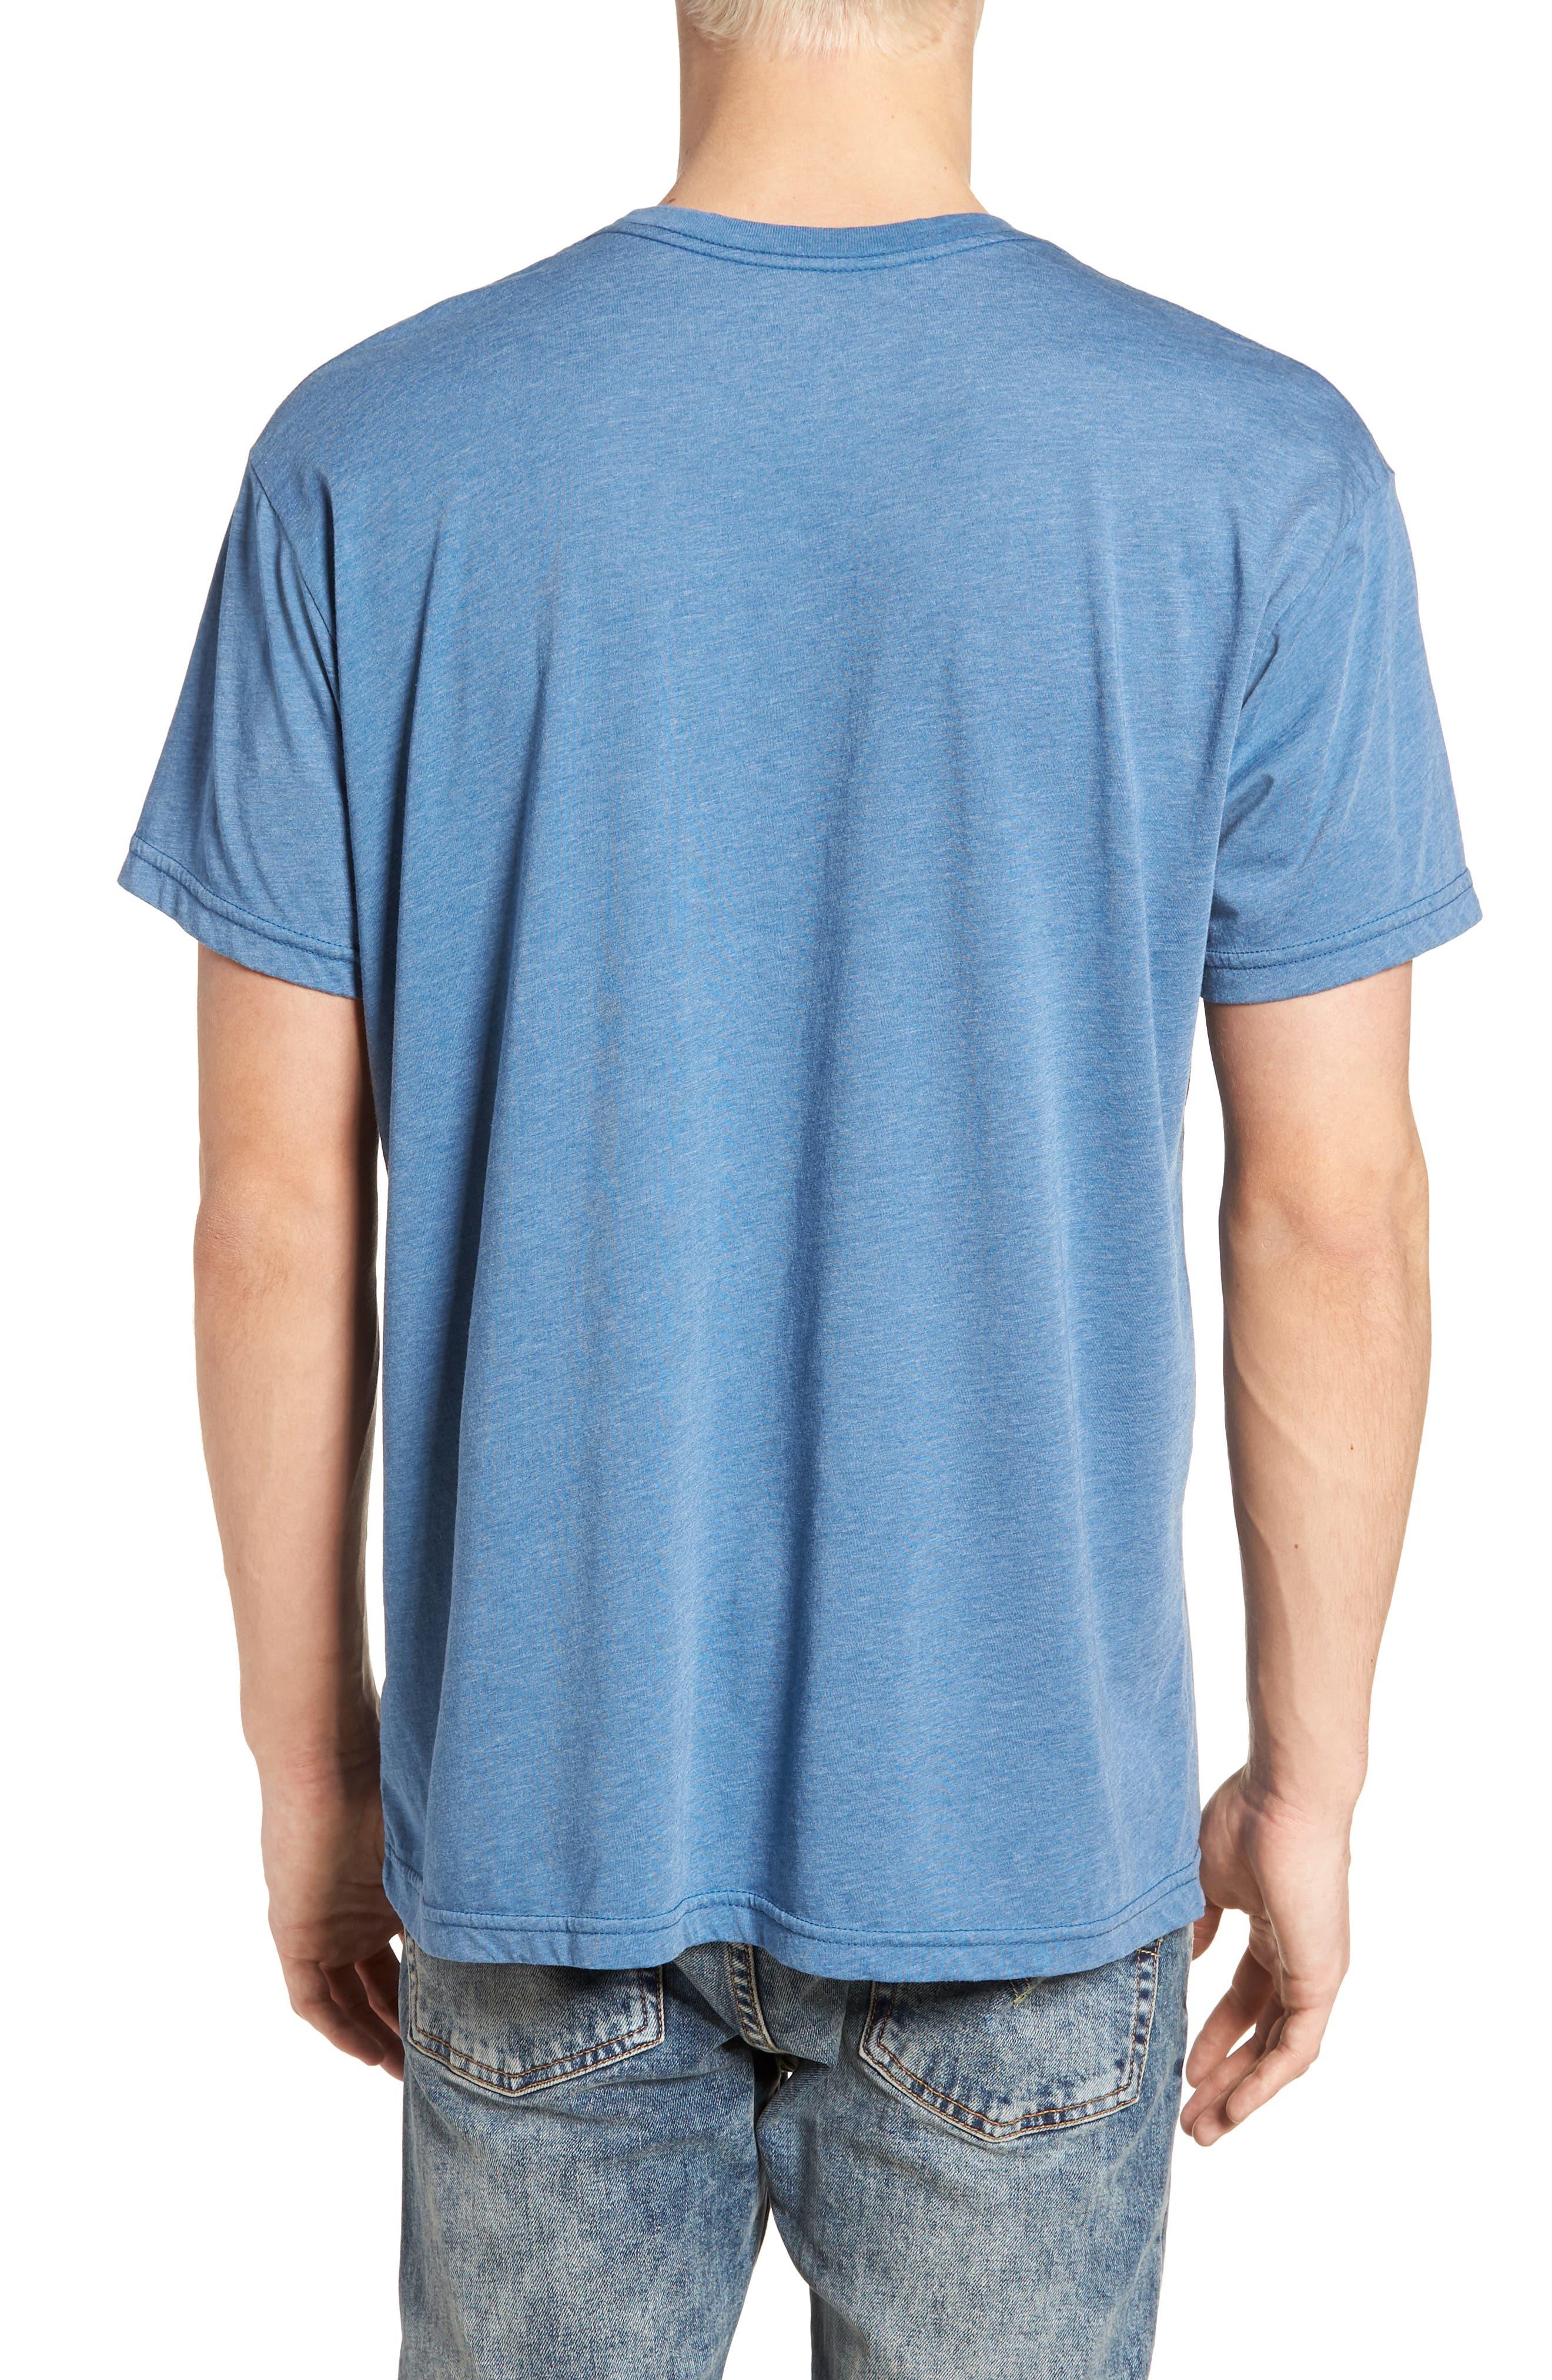 Devo Graphic T-Shirt,                             Alternate thumbnail 2, color,                             400